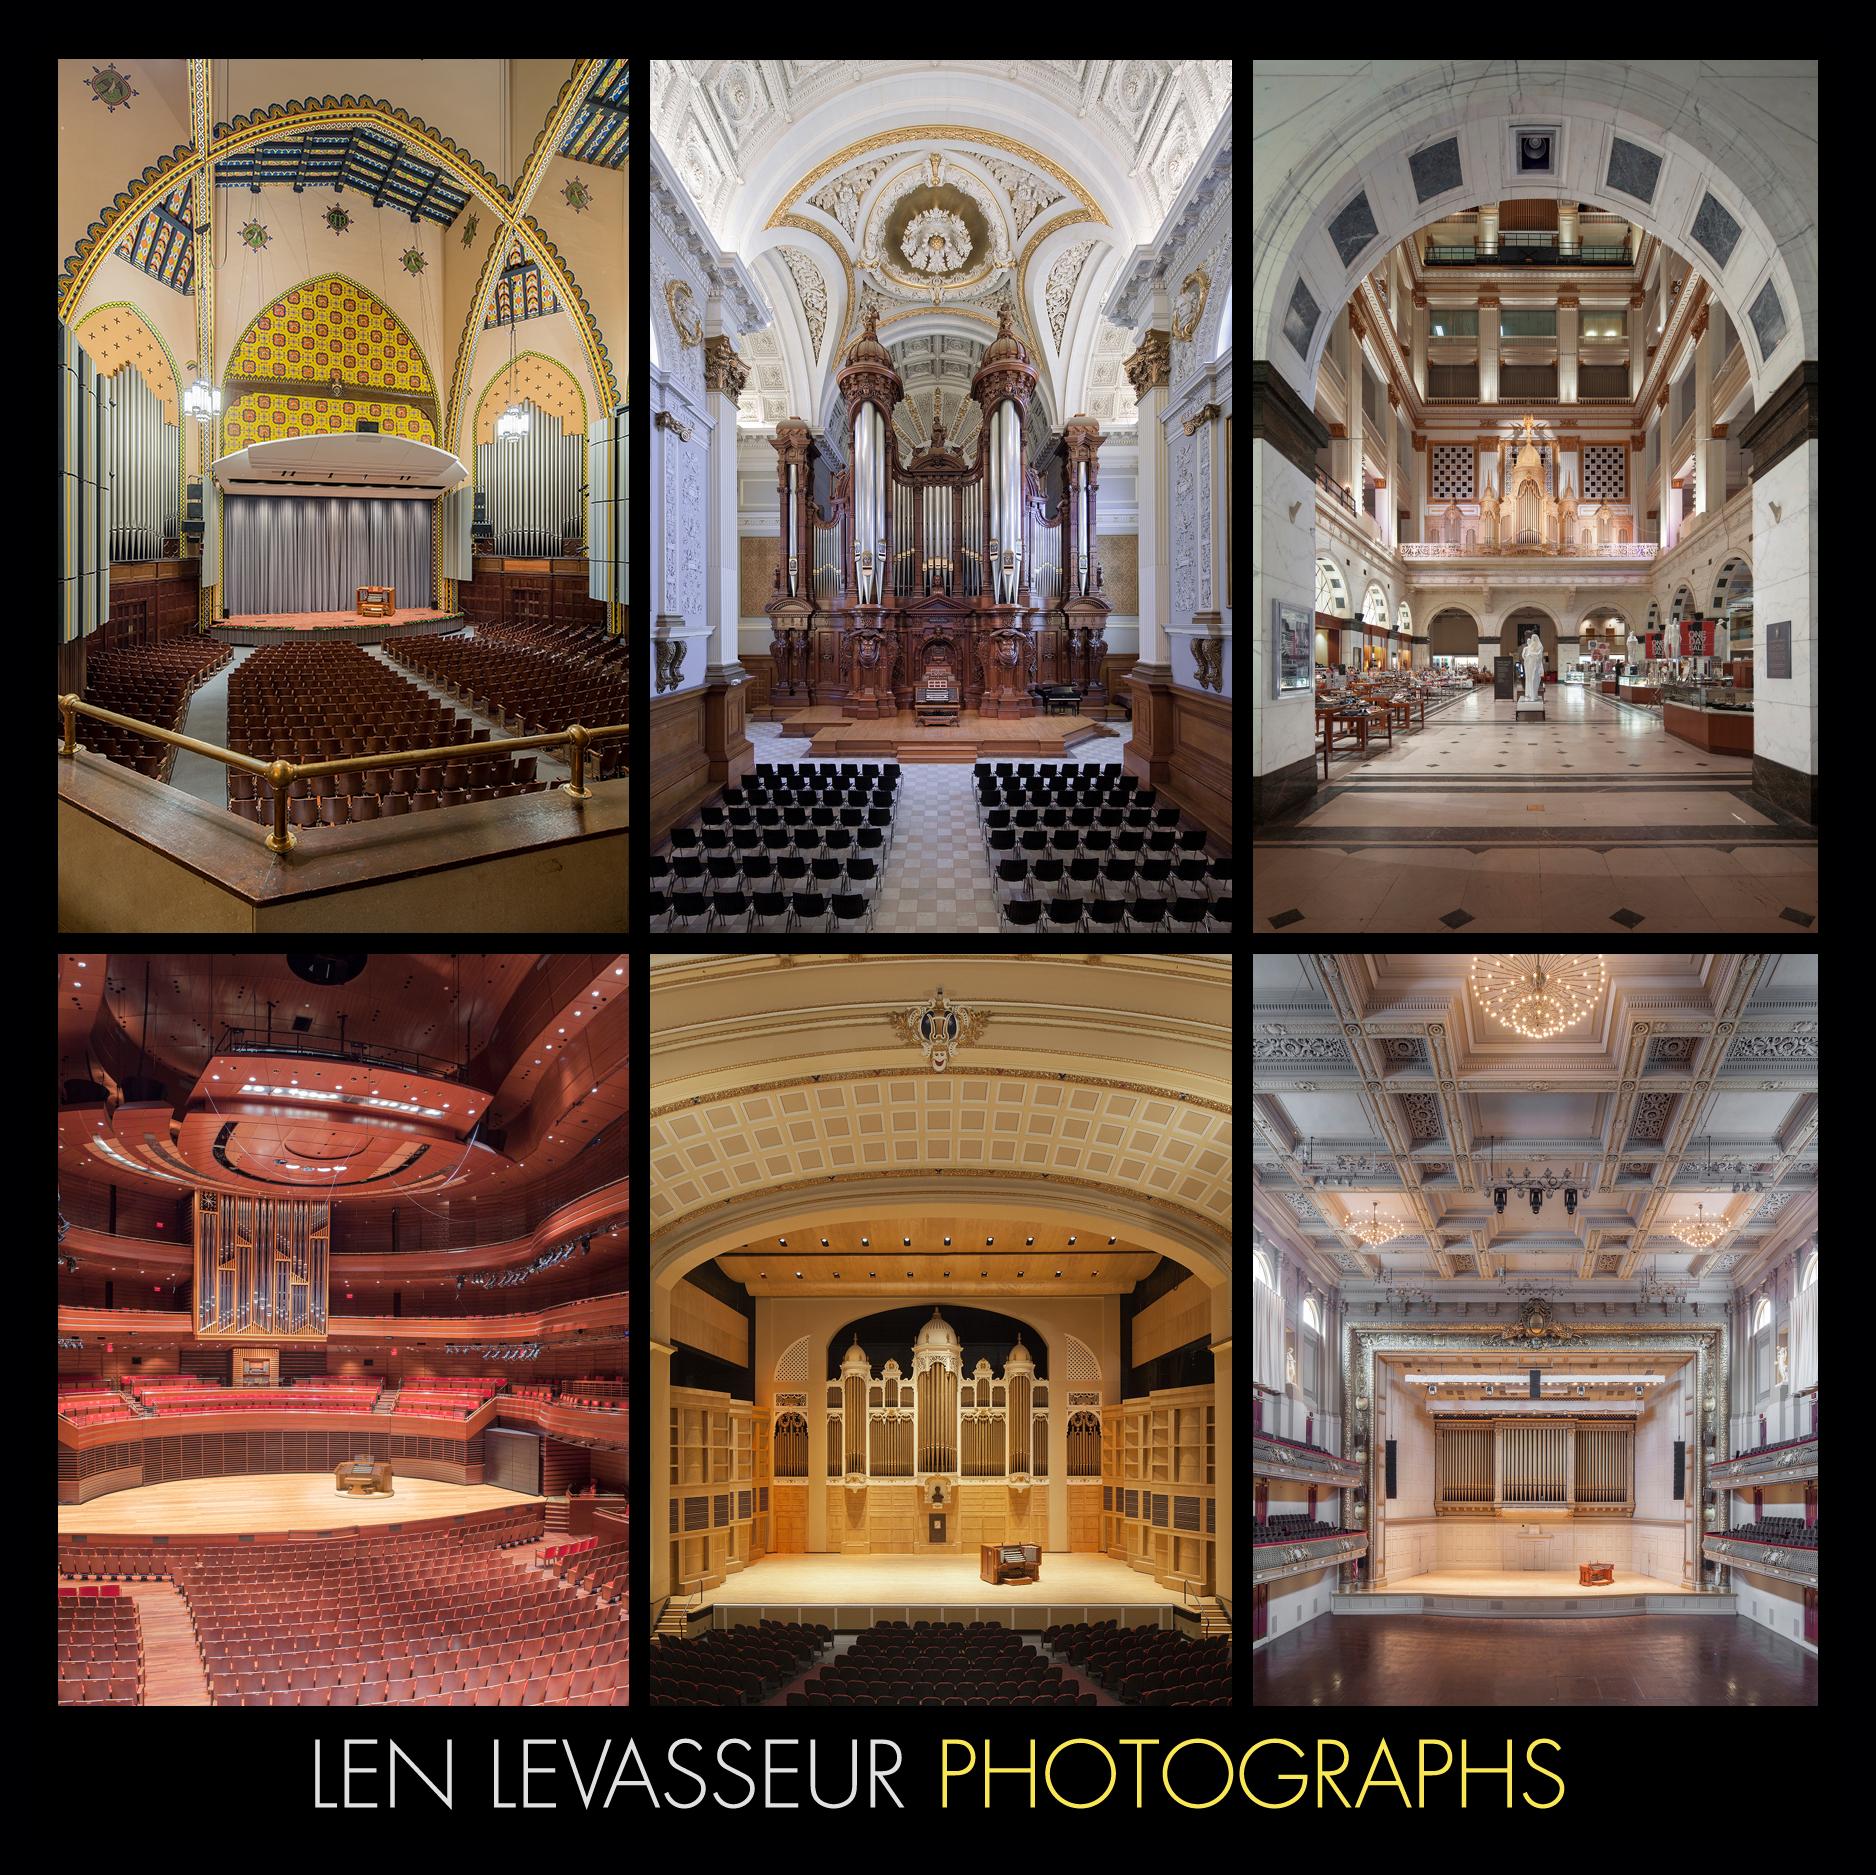 Len Levasseur